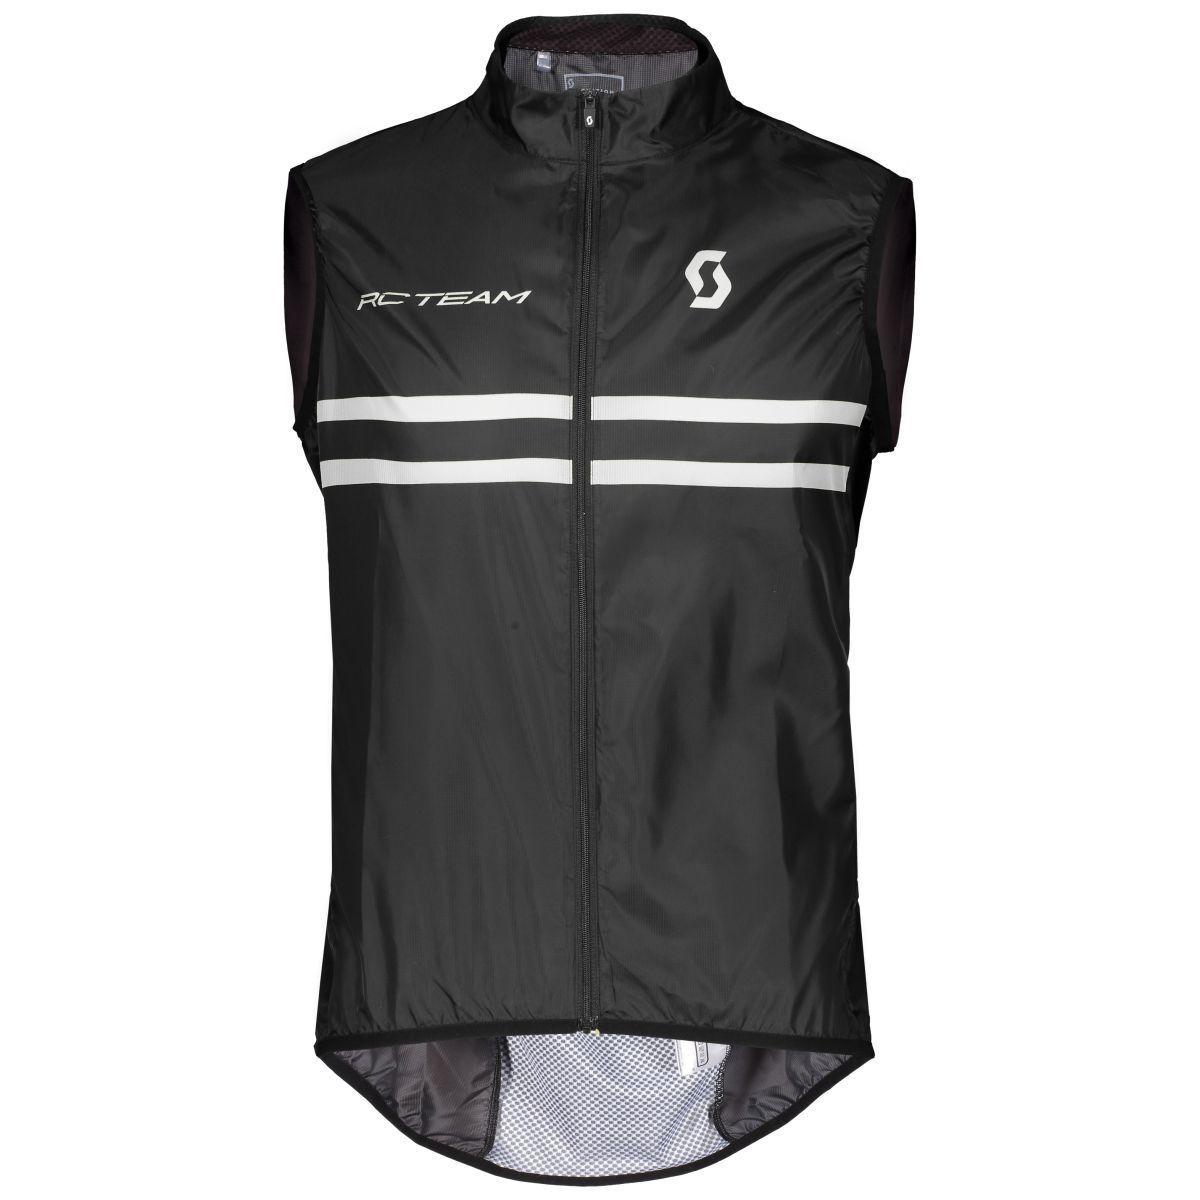 Scott RC Team Fahrrad Windweste black white 2019